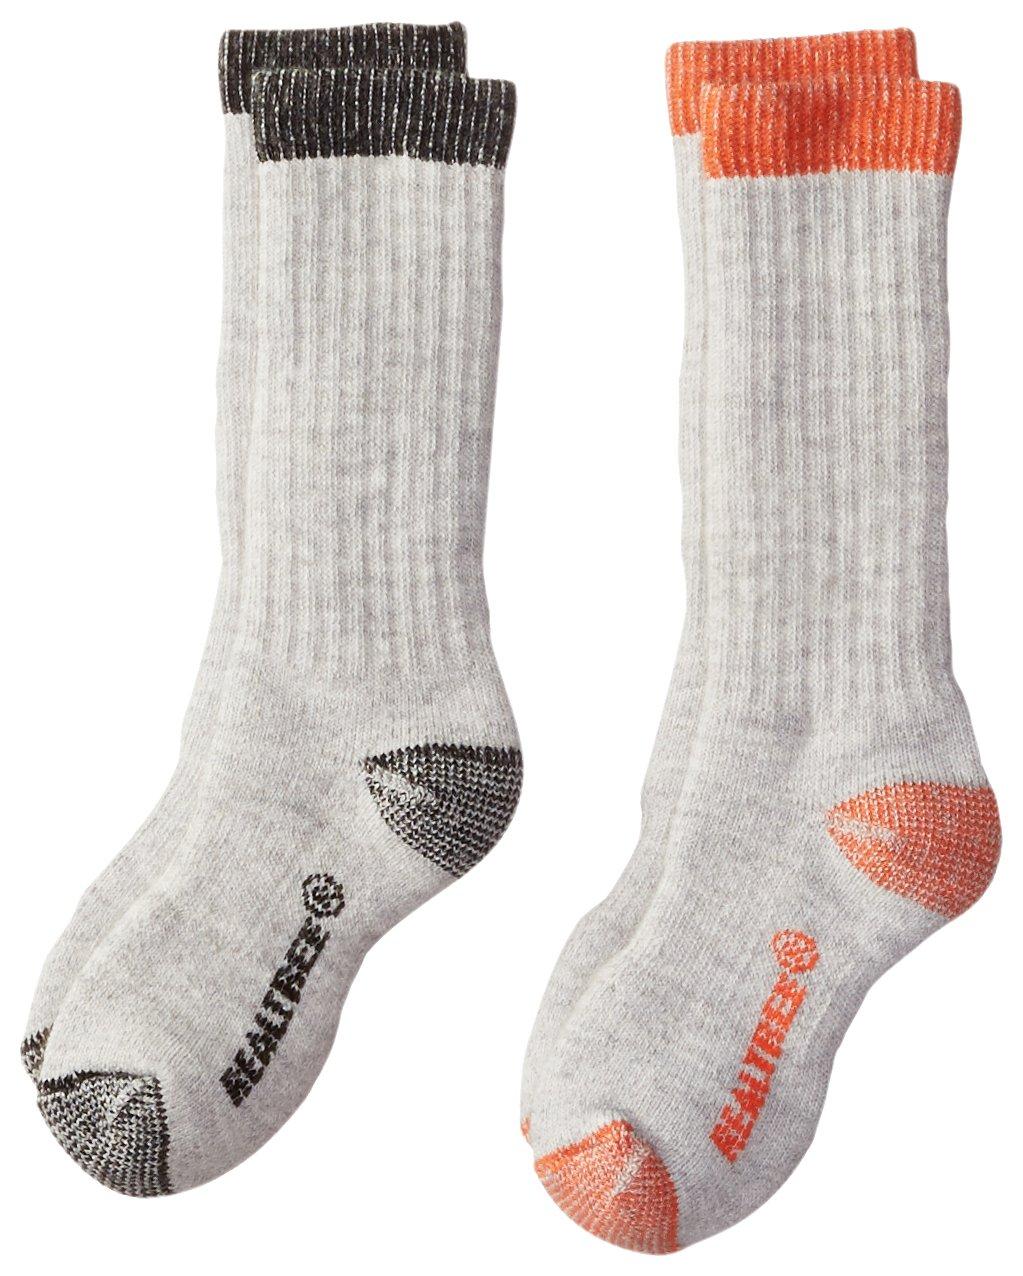 Realtree Boys Merino Boot Socks Pack (2 Pair), Assorted Colors, Small